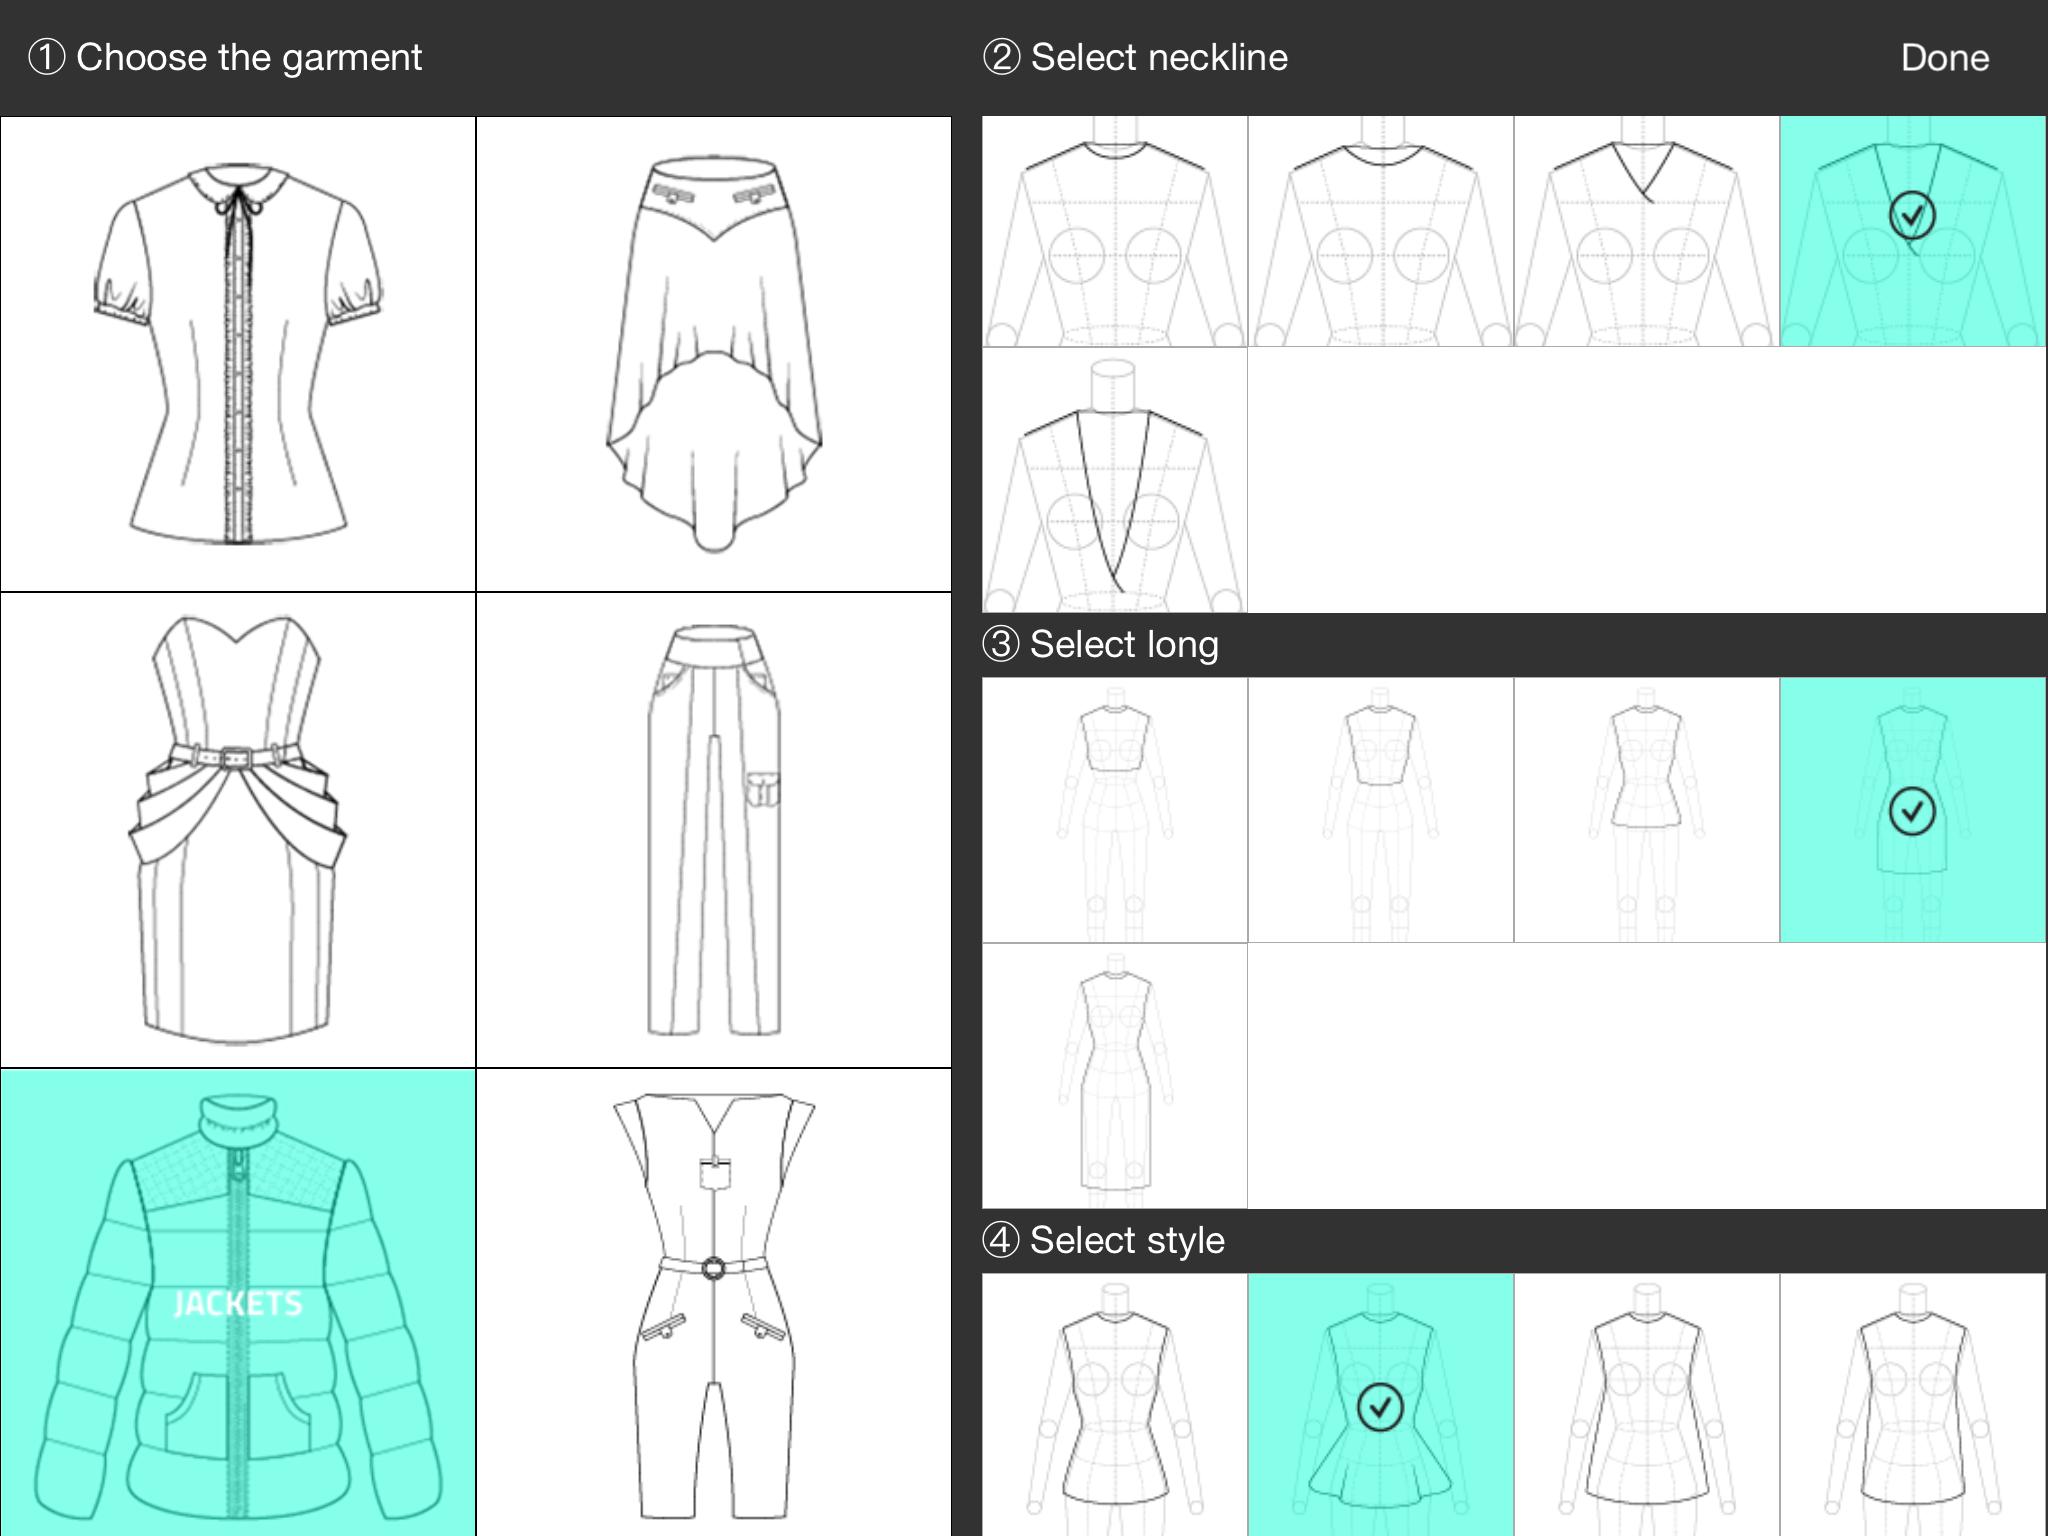 Clothes Design App Design Clothes Easily On Your Devices In 2020 Design Clothes App Fashion Designing Apps Fashion Design Clothes